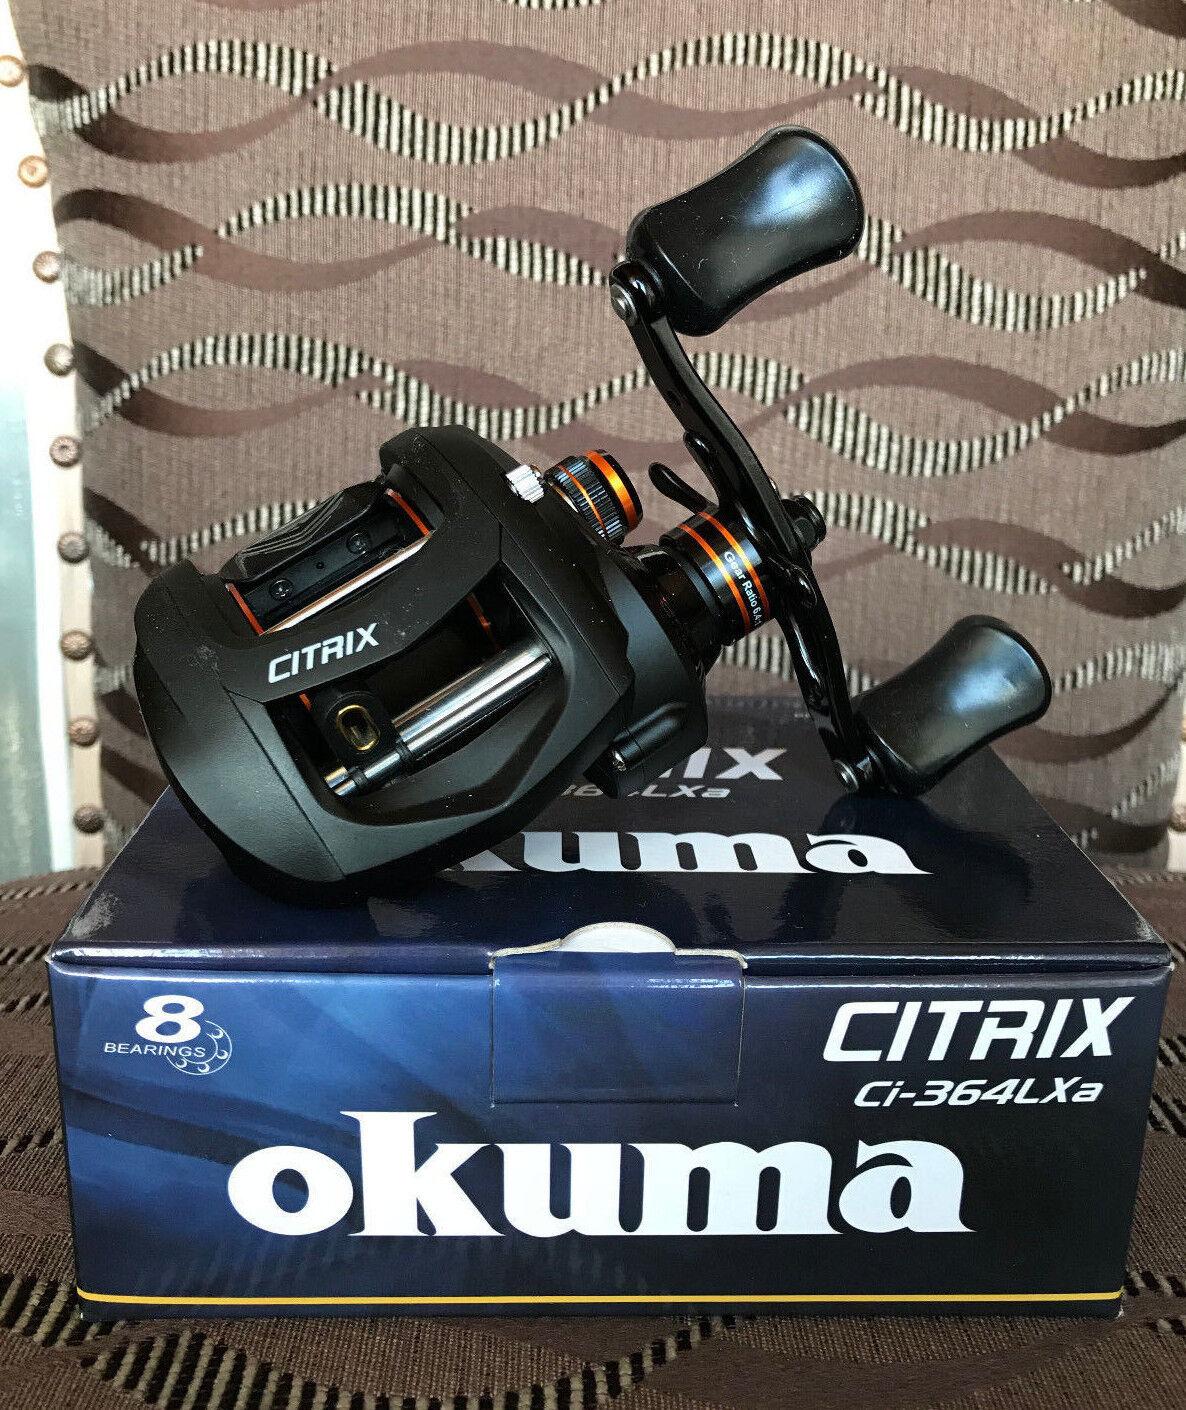 OKUMA CITRIX ci364lxa Sinistro Mano Baitcaster multi ruolo